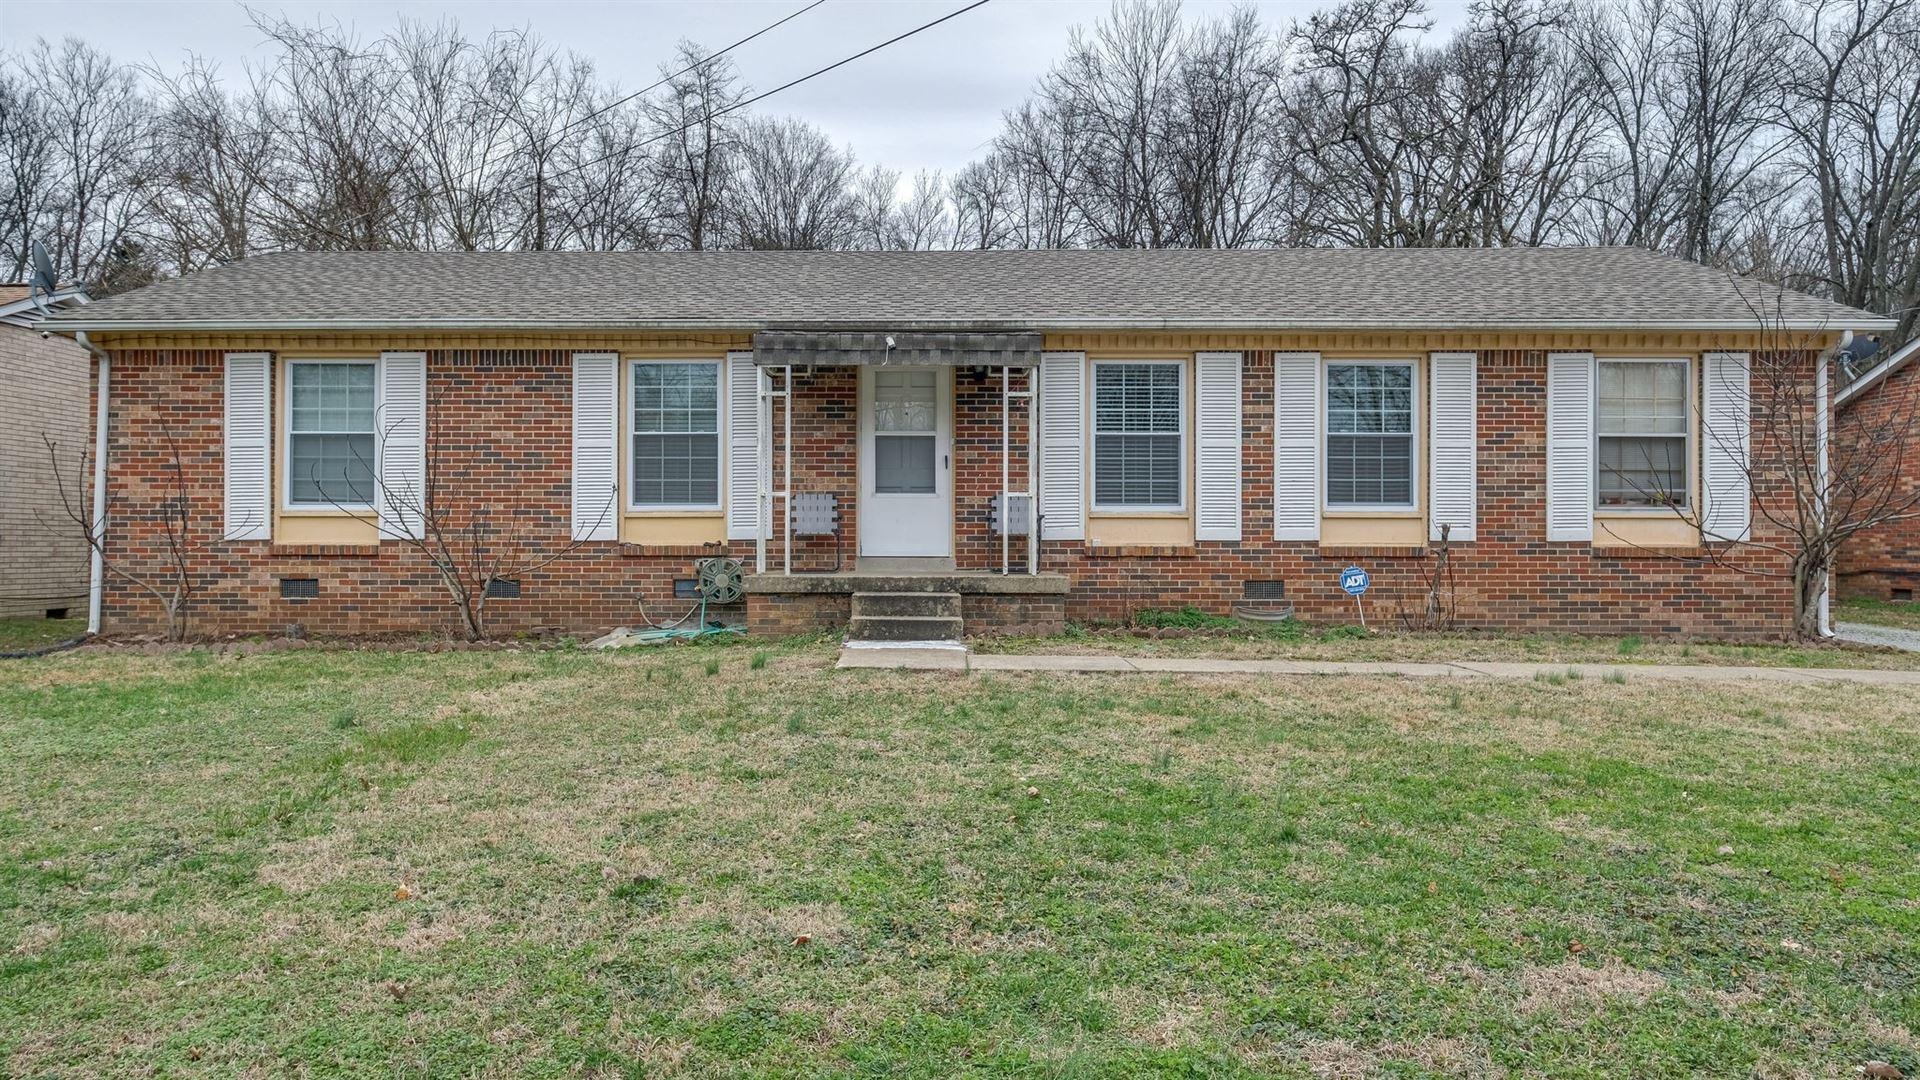 47 Benzing Rd, Antioch, TN 37013 - MLS#: 2294187